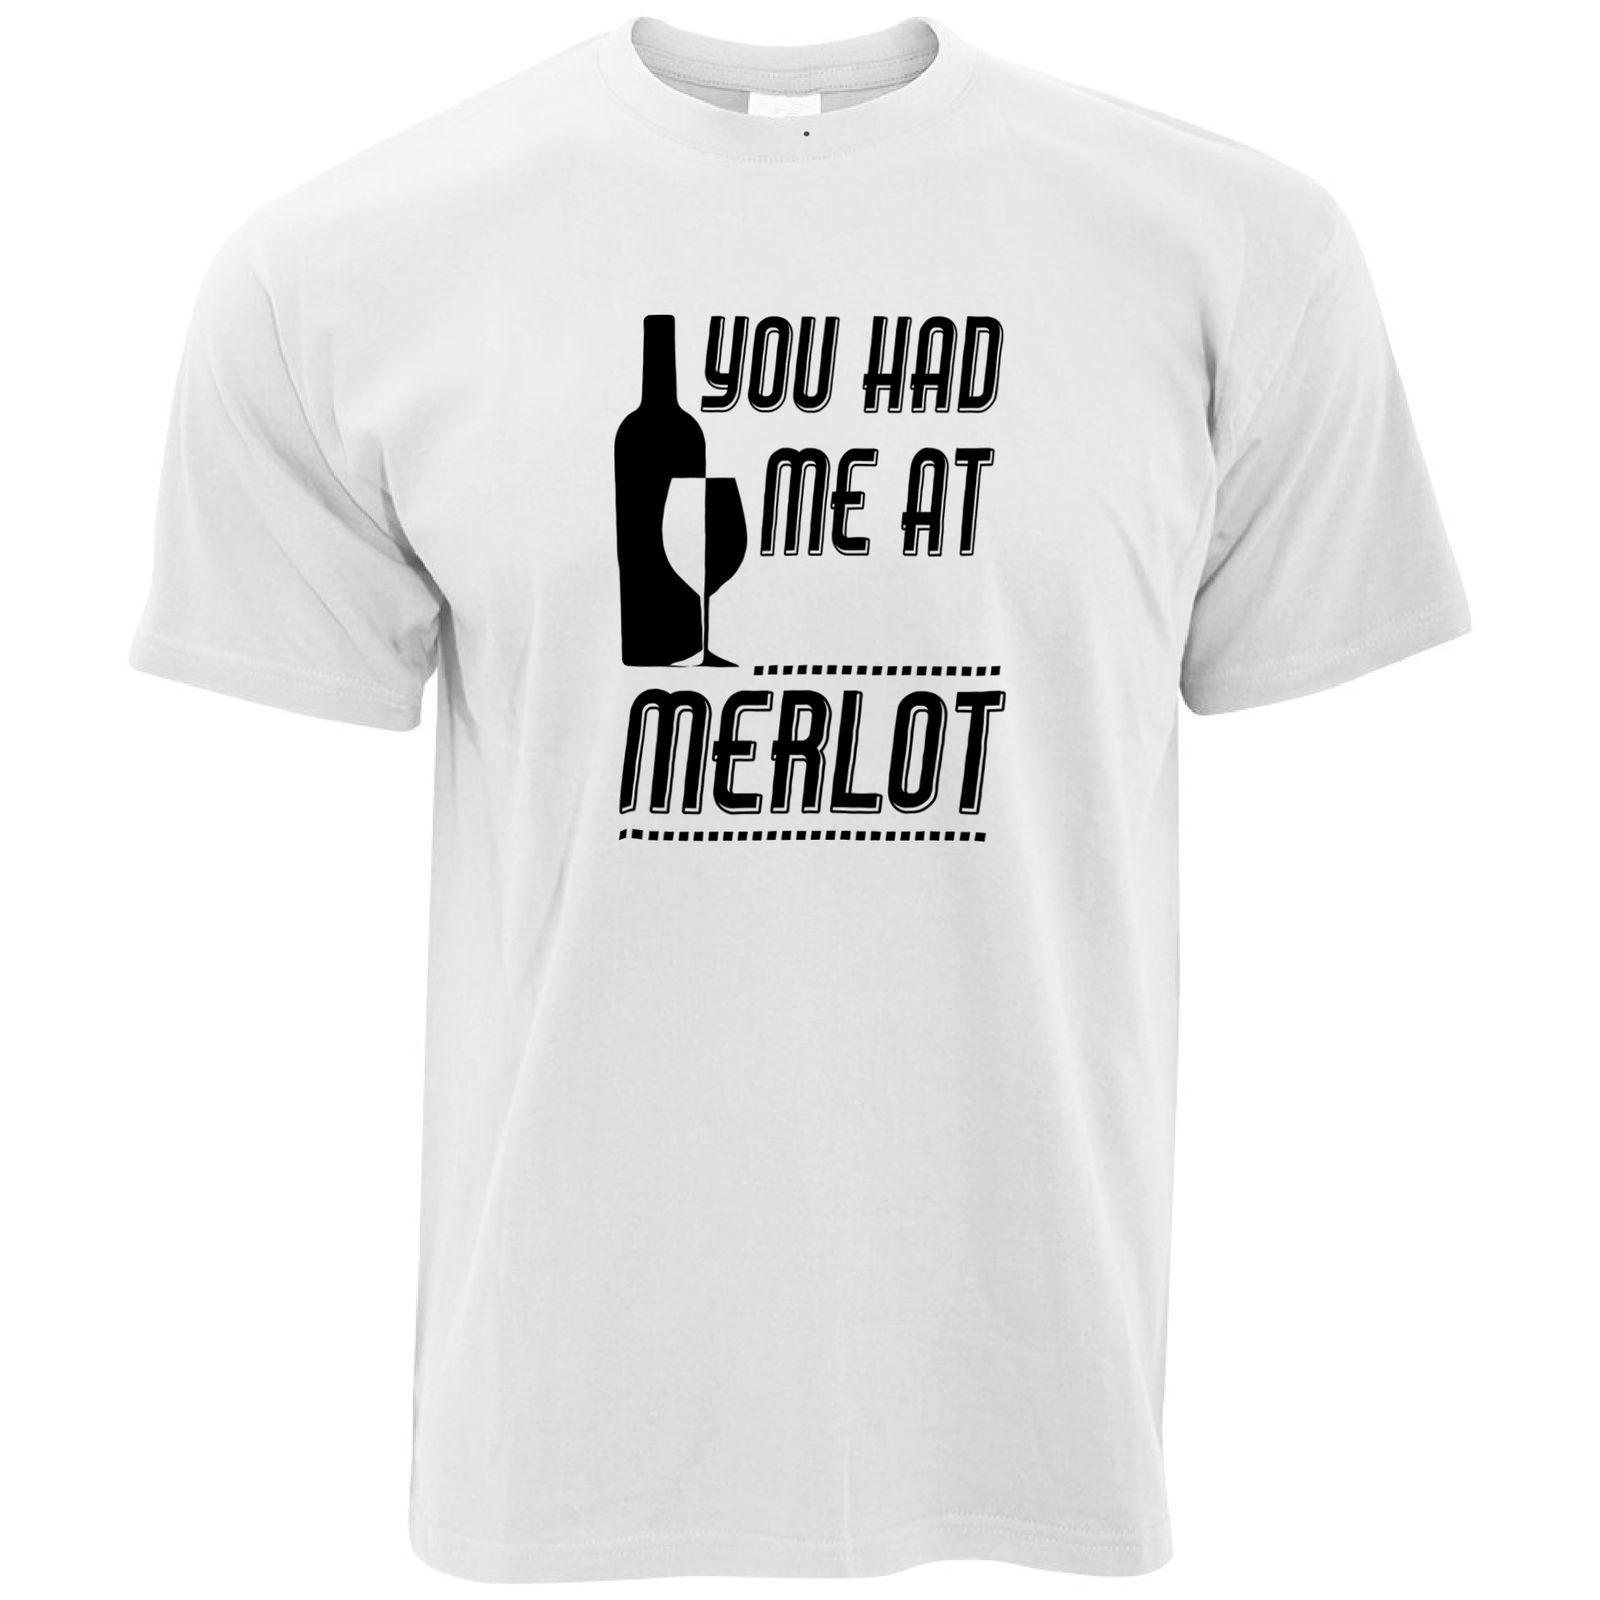 e71e6507 Novelty Drinking T Shirt You Had Me At Merlot Slogan Party Wine Dating Mum  Men Women Unisex Fashion Tshirt T Shirts Online Shopping Buy T Shirts From  ...